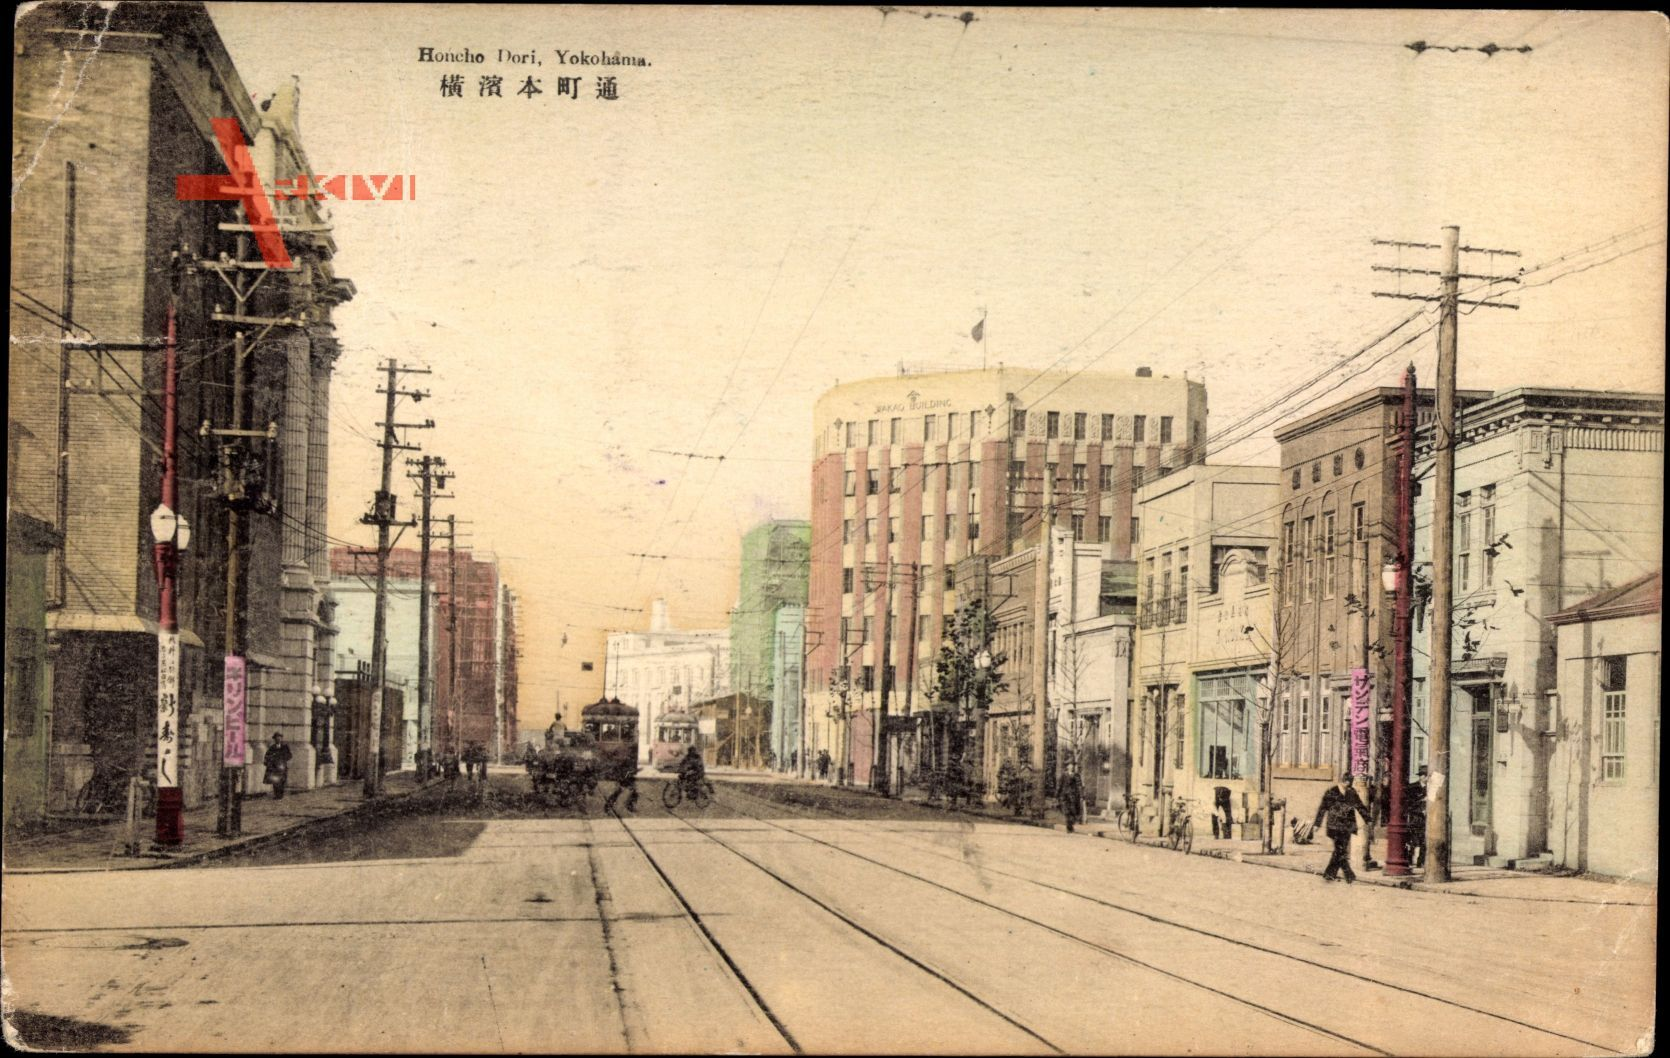 Yokohama Präf. Kanagawa Japan, Honcho Dori, Straßenpartie